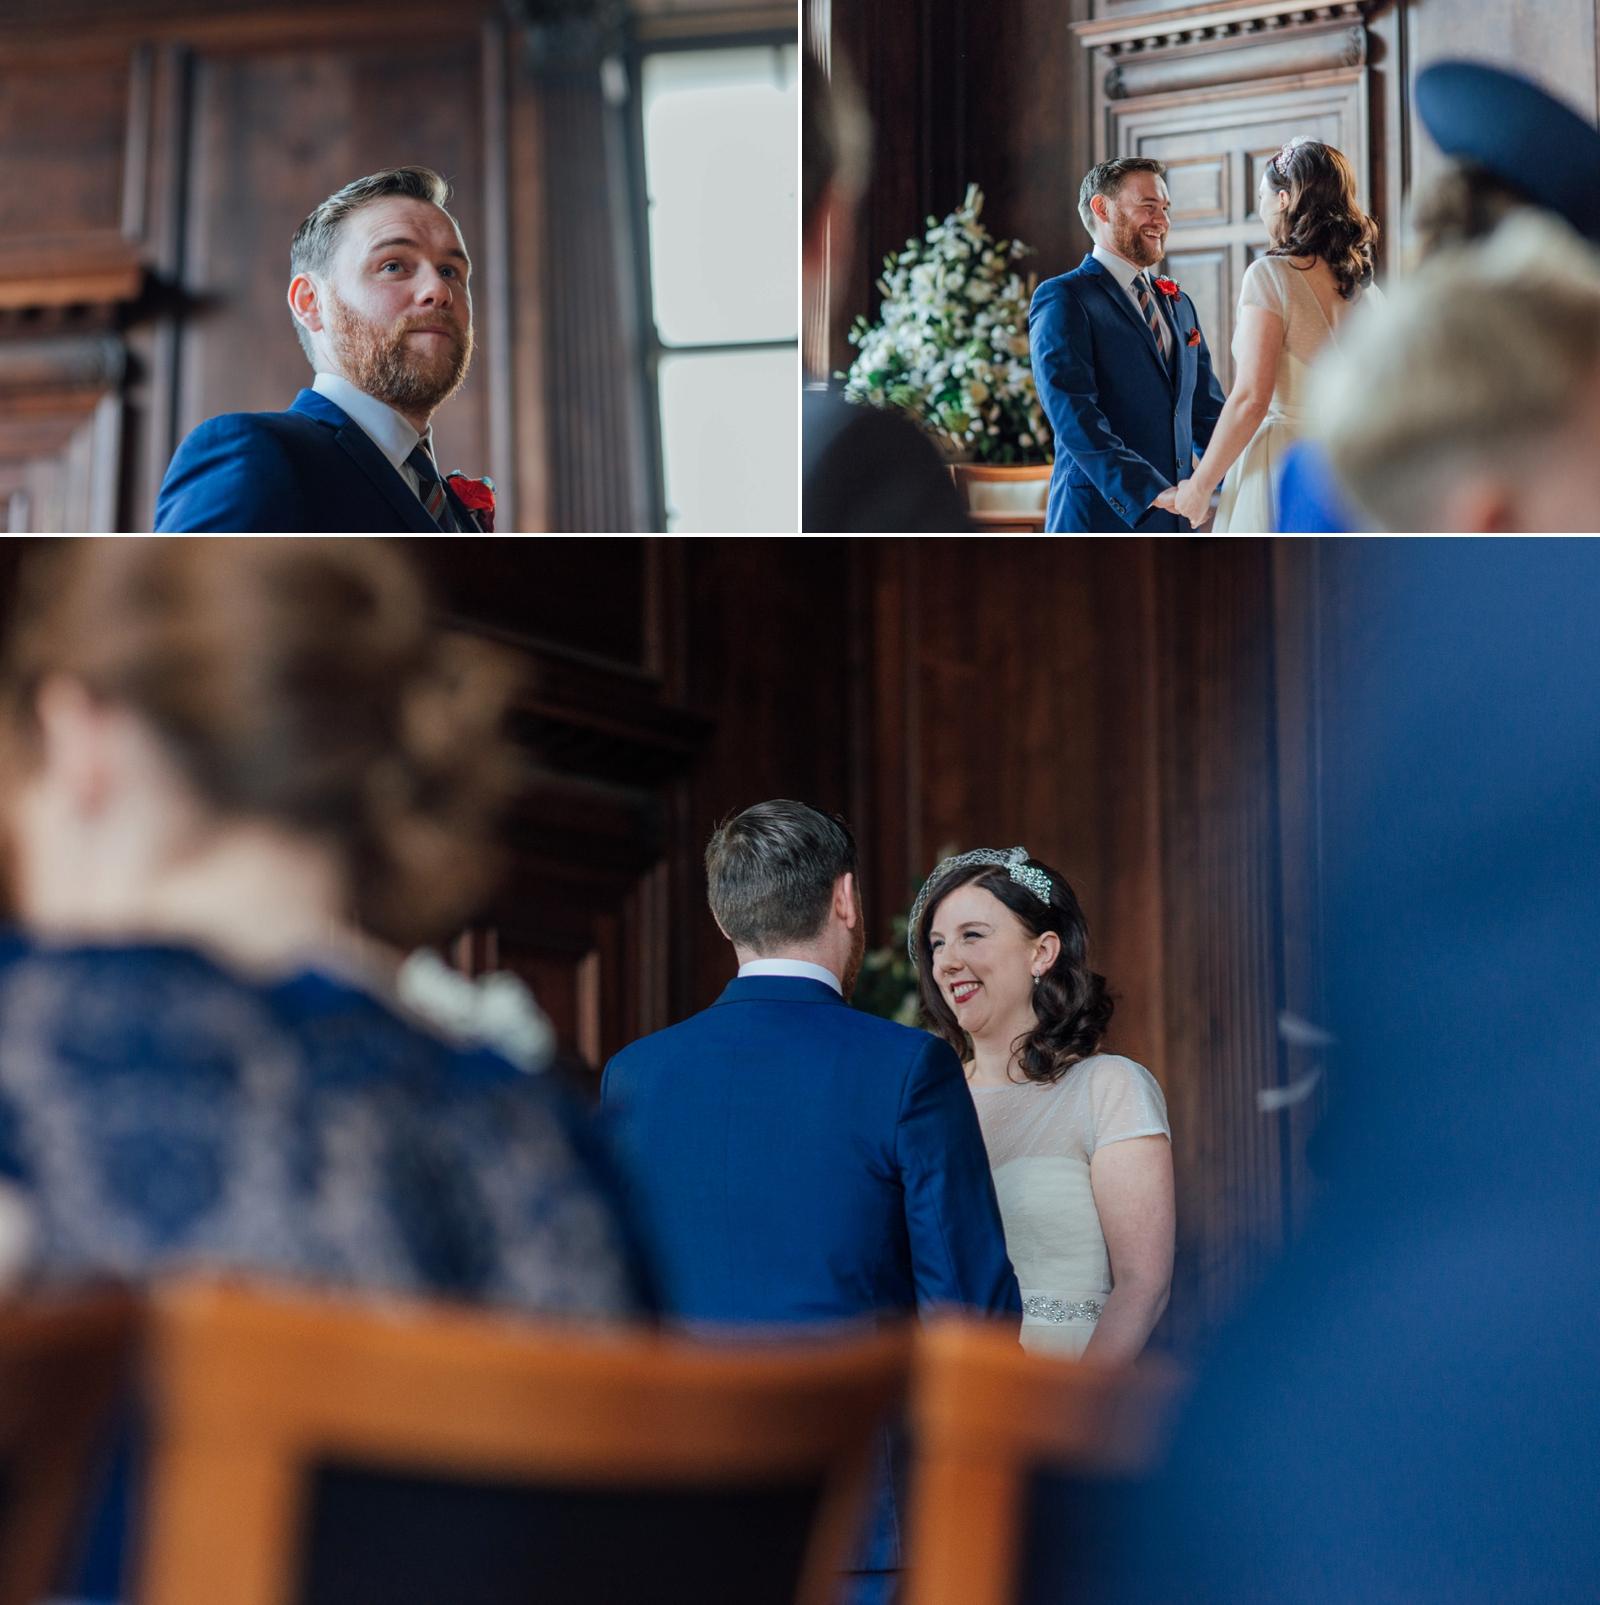 thecaves_retro_DIY_wedding_00036.jpg